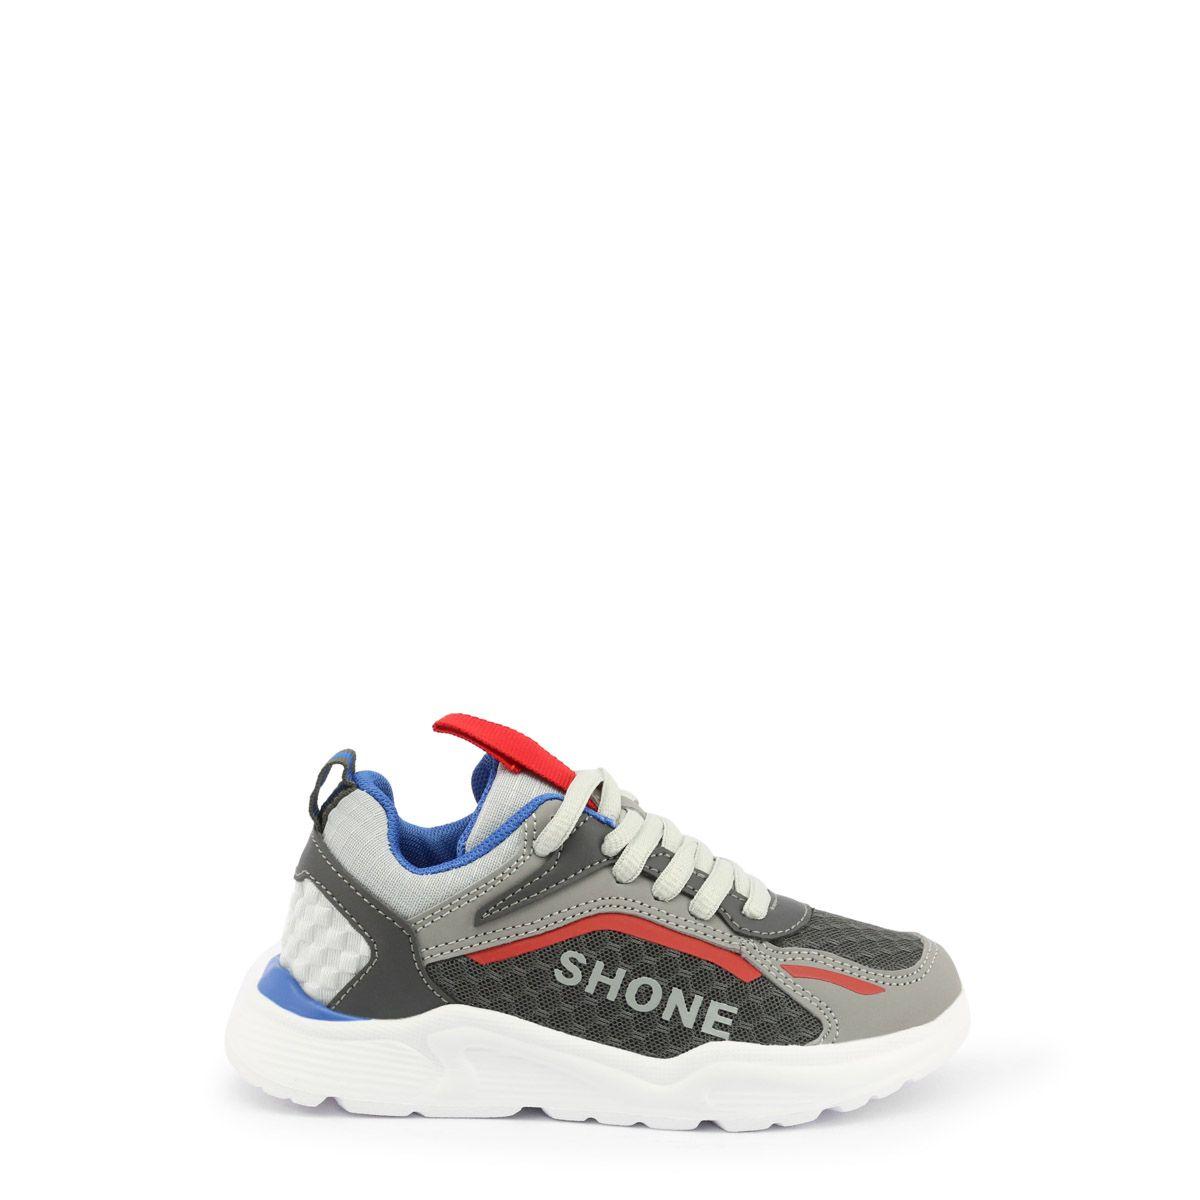 Shone - 903-001